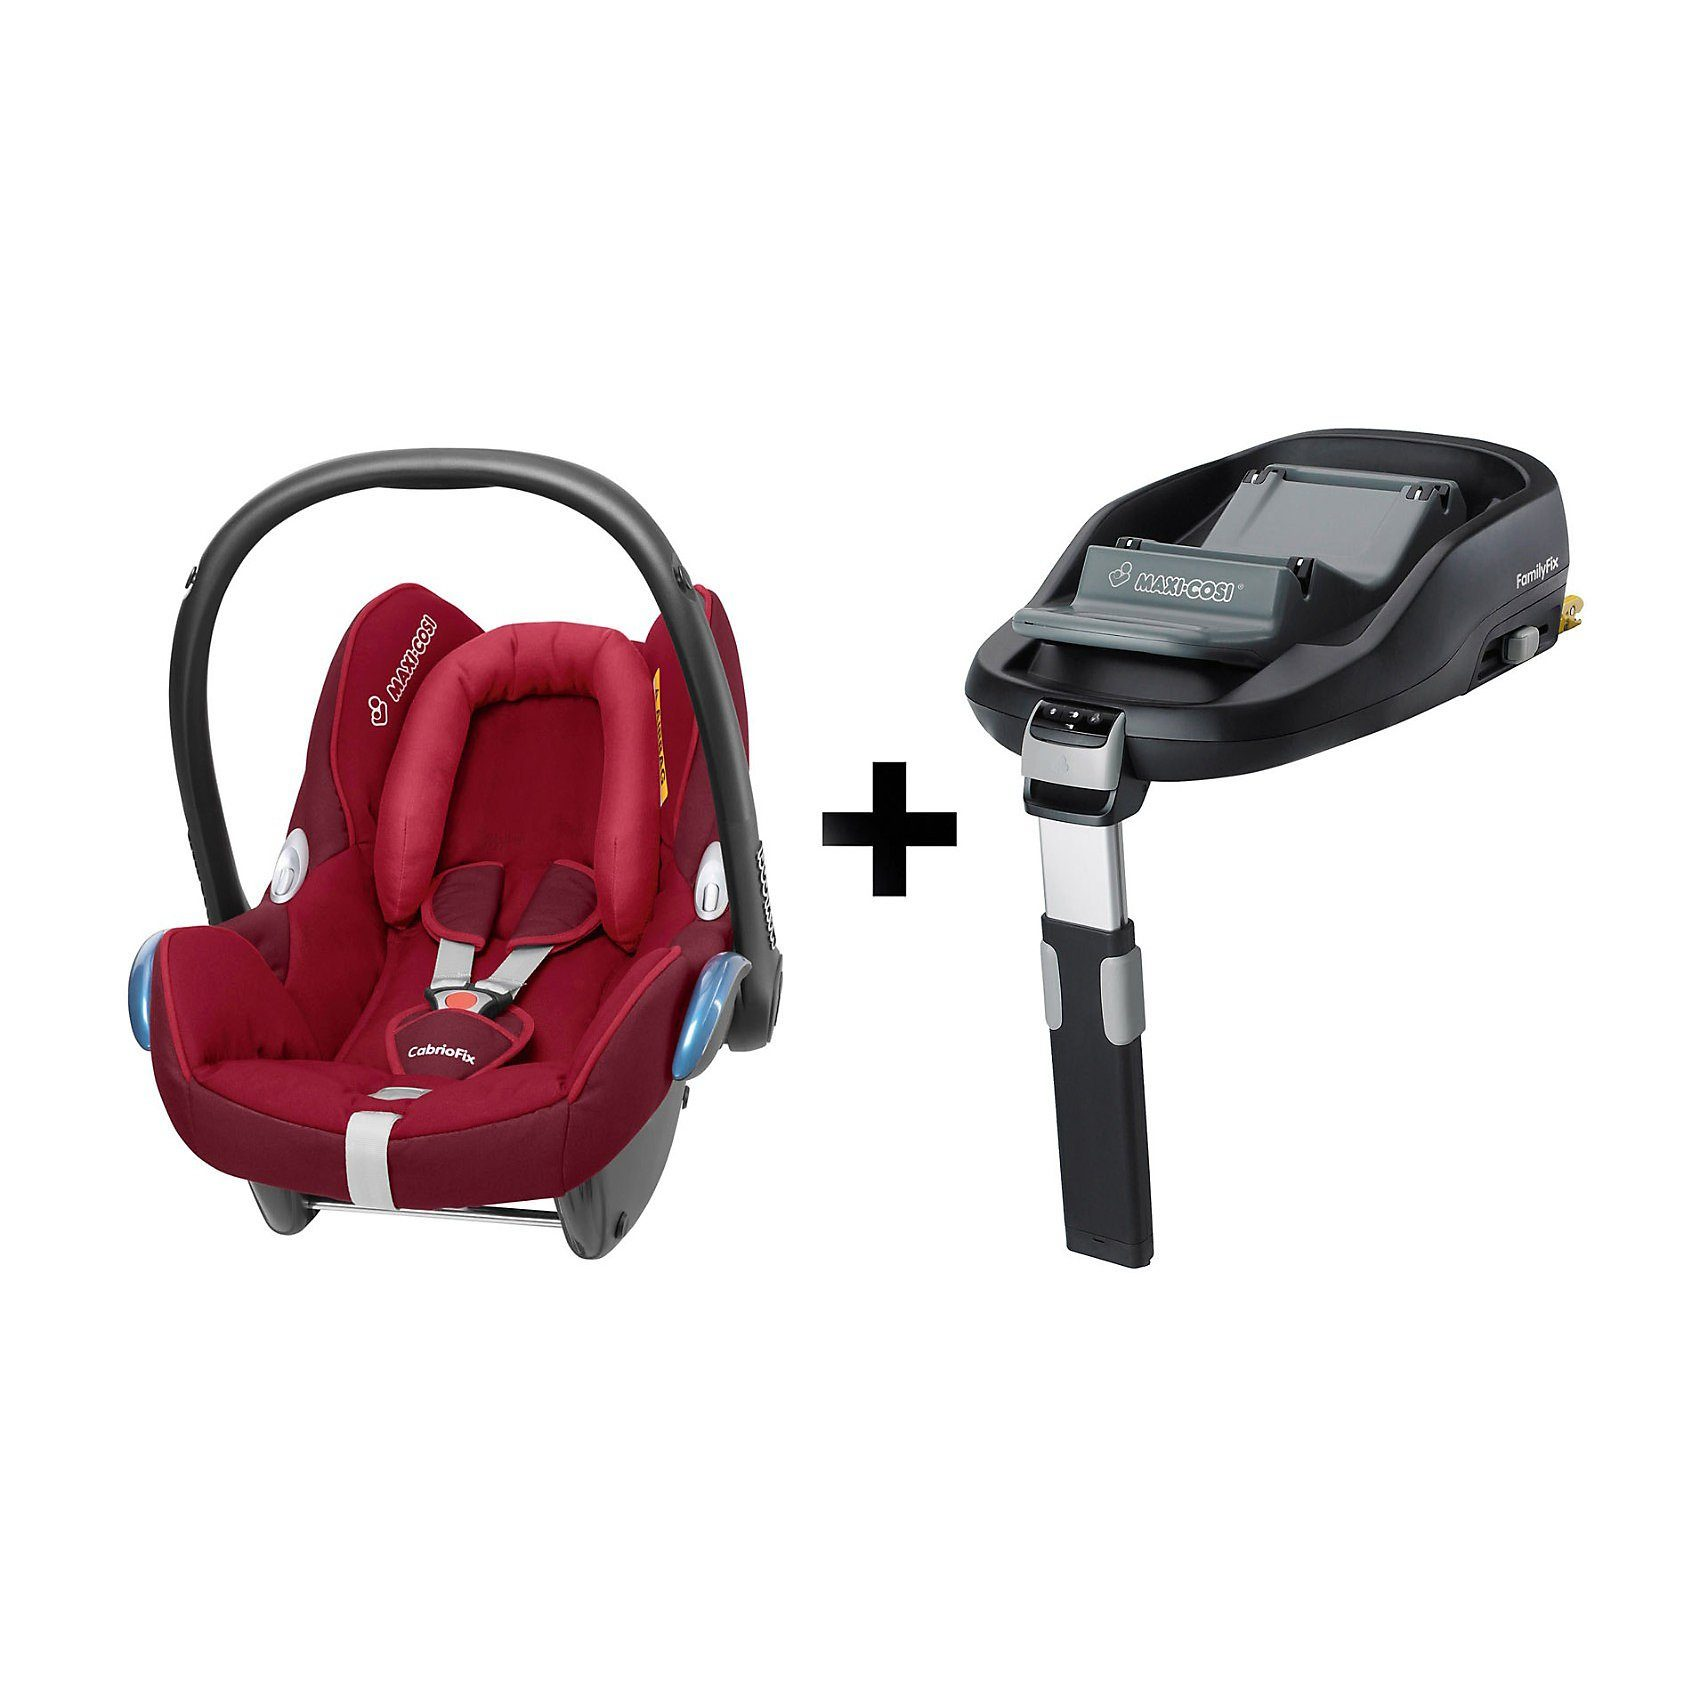 Maxi-Cosi Babyschale Cabriofix, Raspberry Red, inkl. FamilyFix